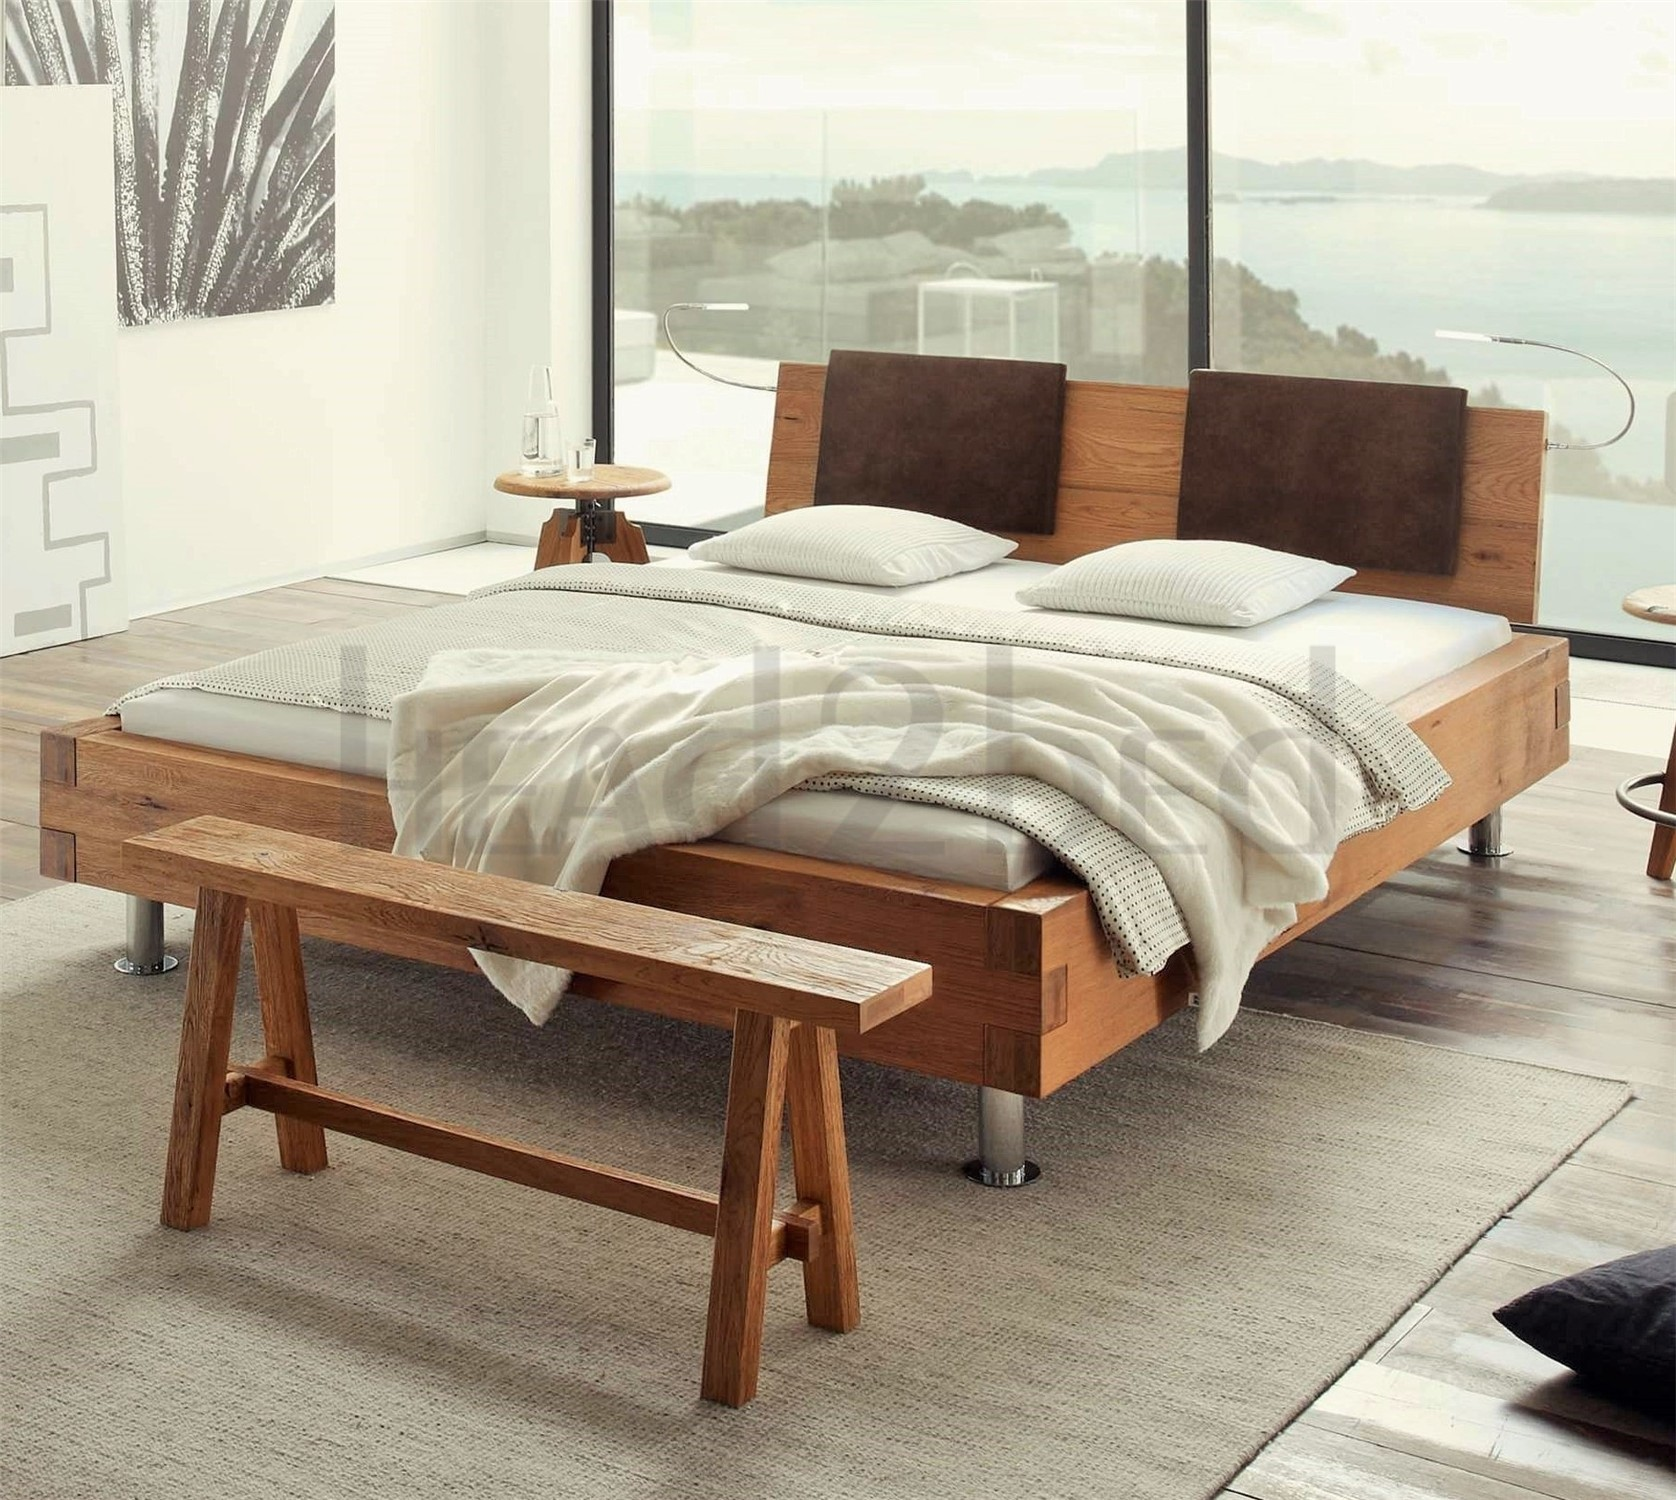 Oak Bedroom Contemporary Designer Beds A Hasena Pilatus Grado Sion Character